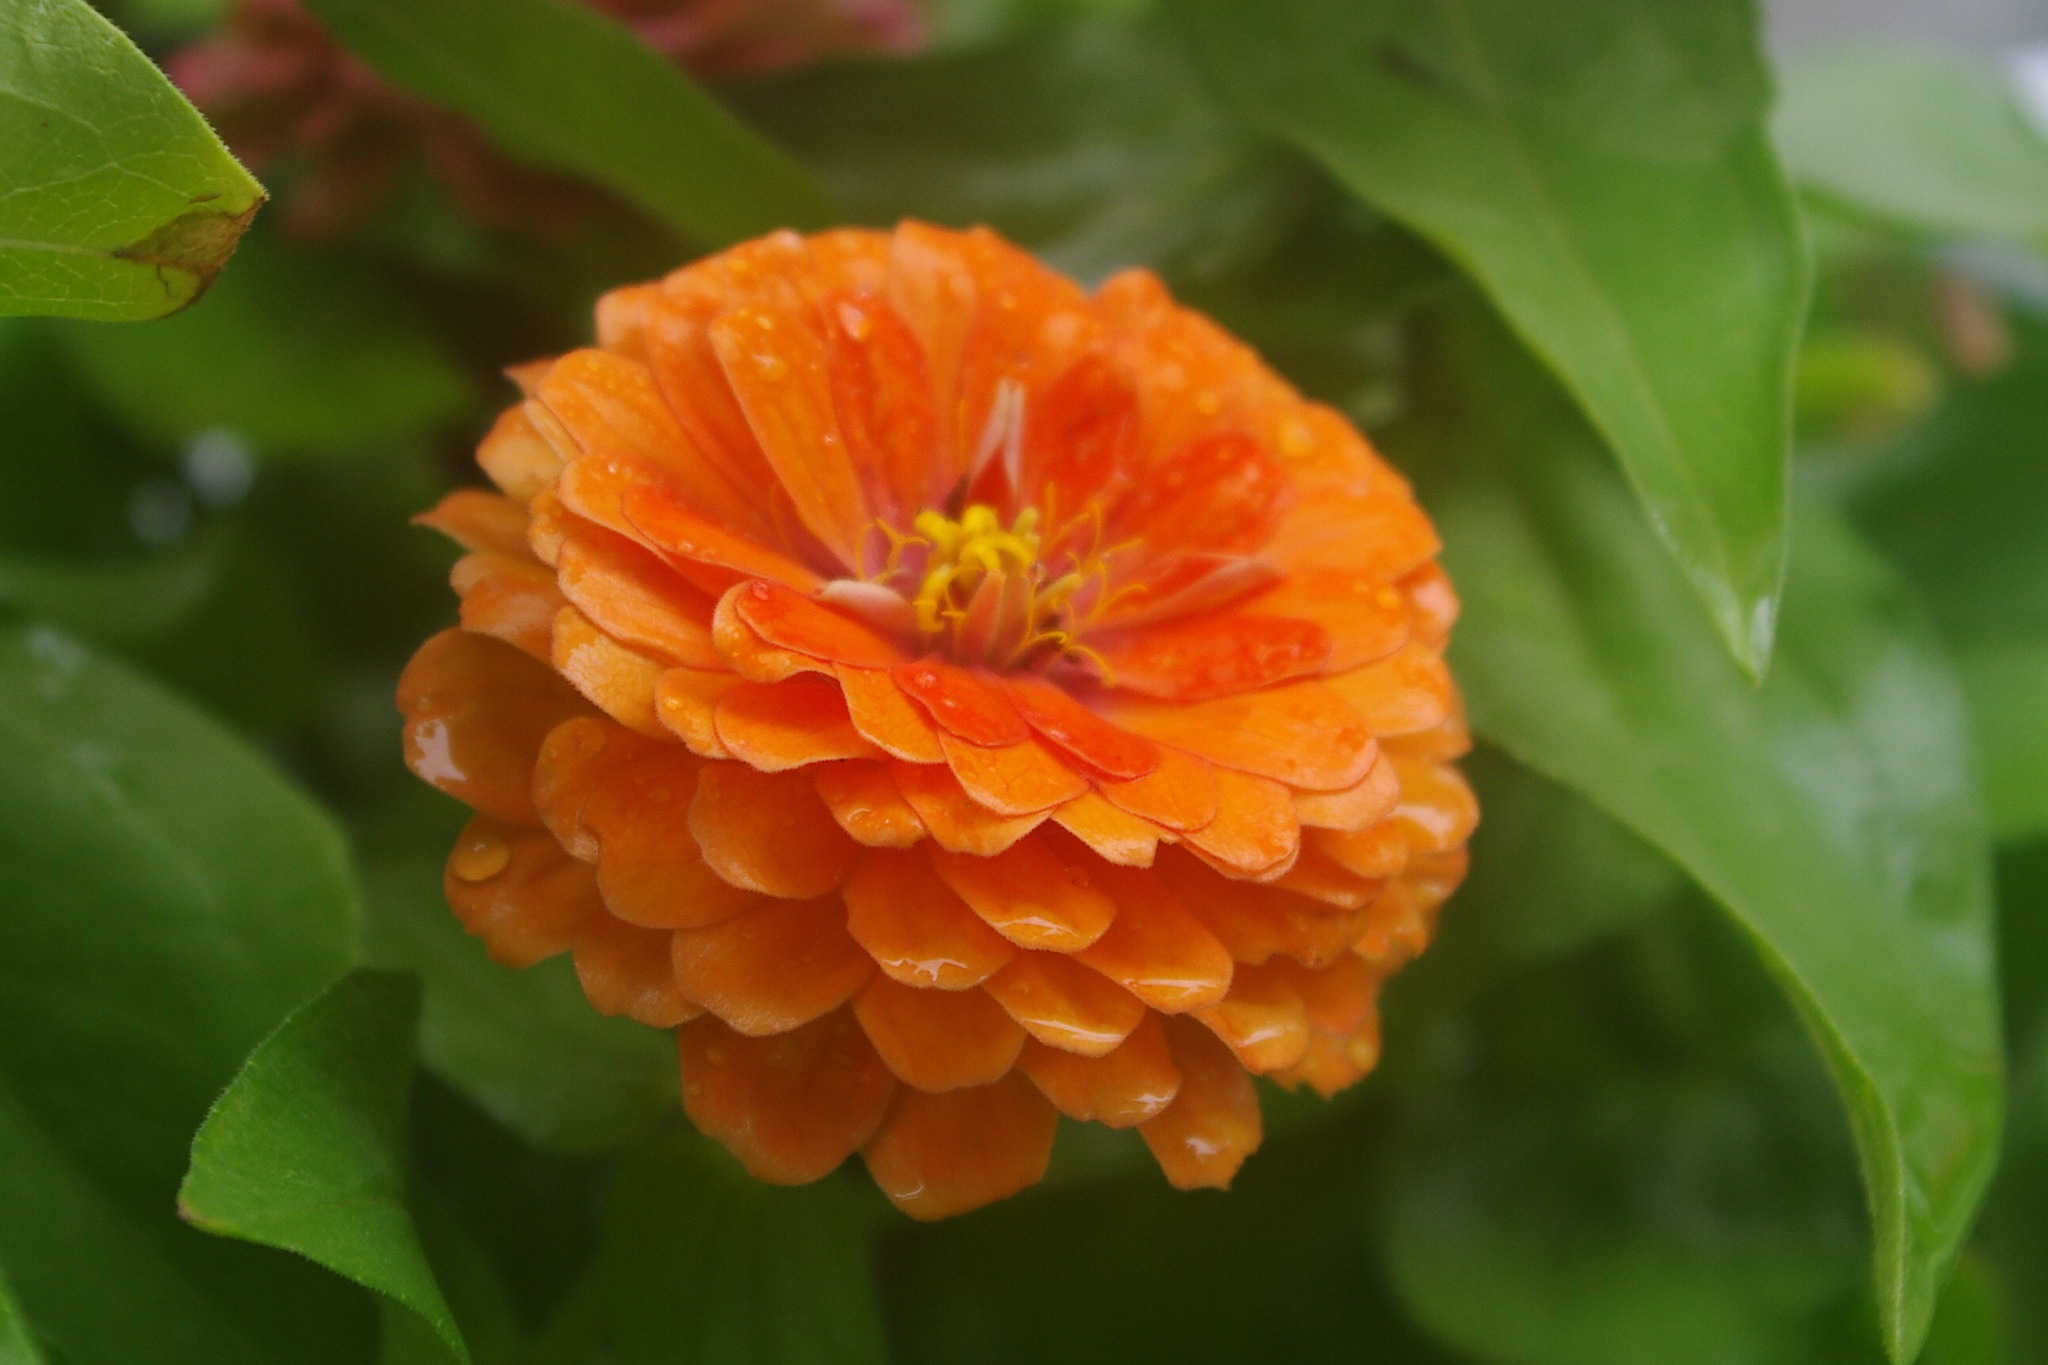 Summer beauty by denise.bouvier.3